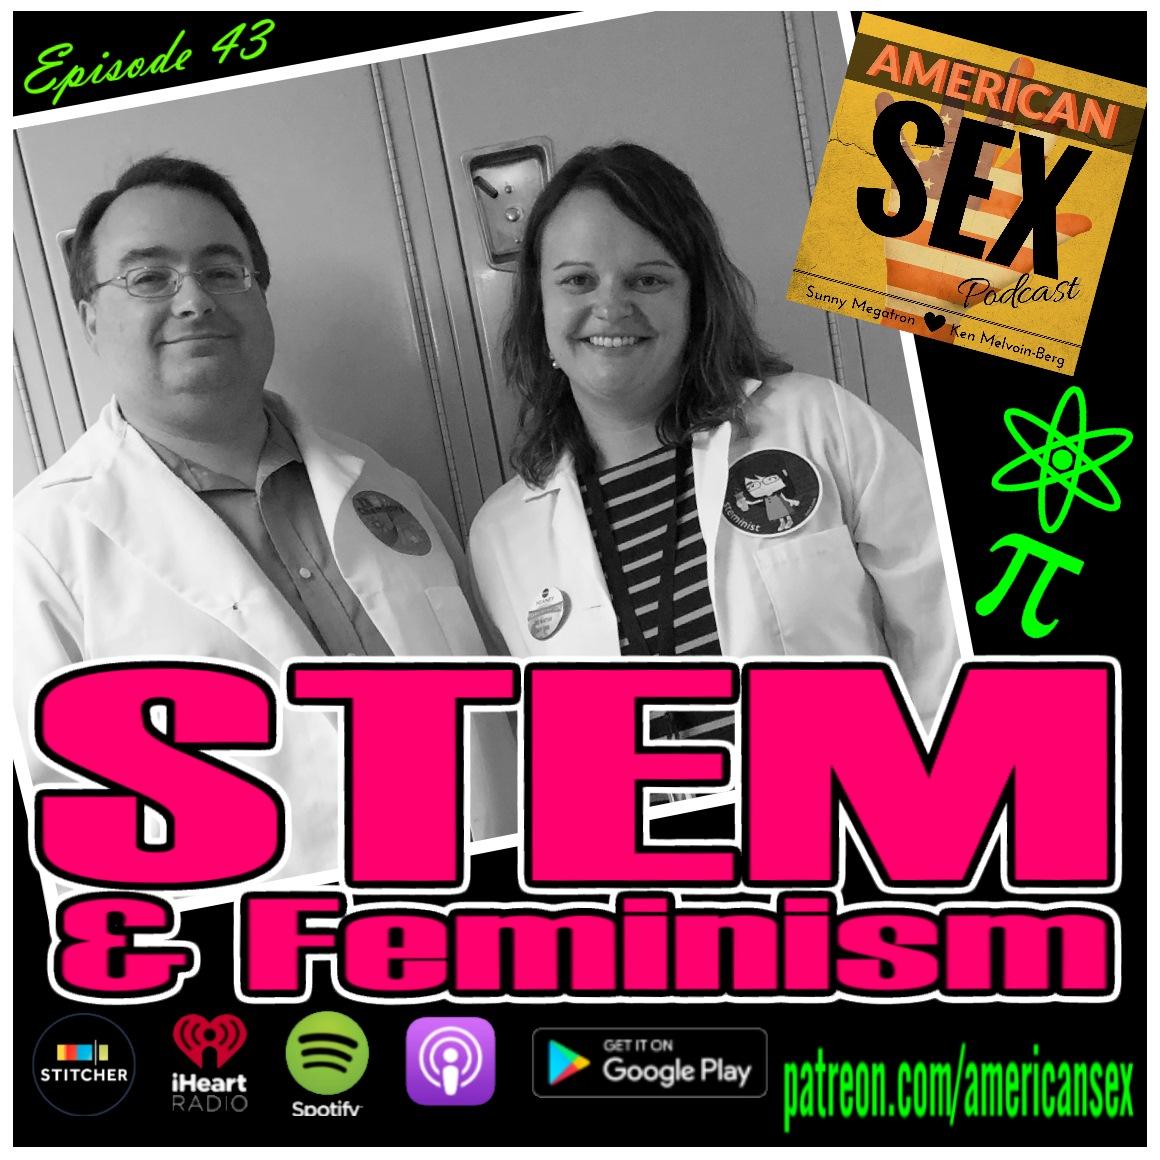 STEM and Feminism American Sex Podcast